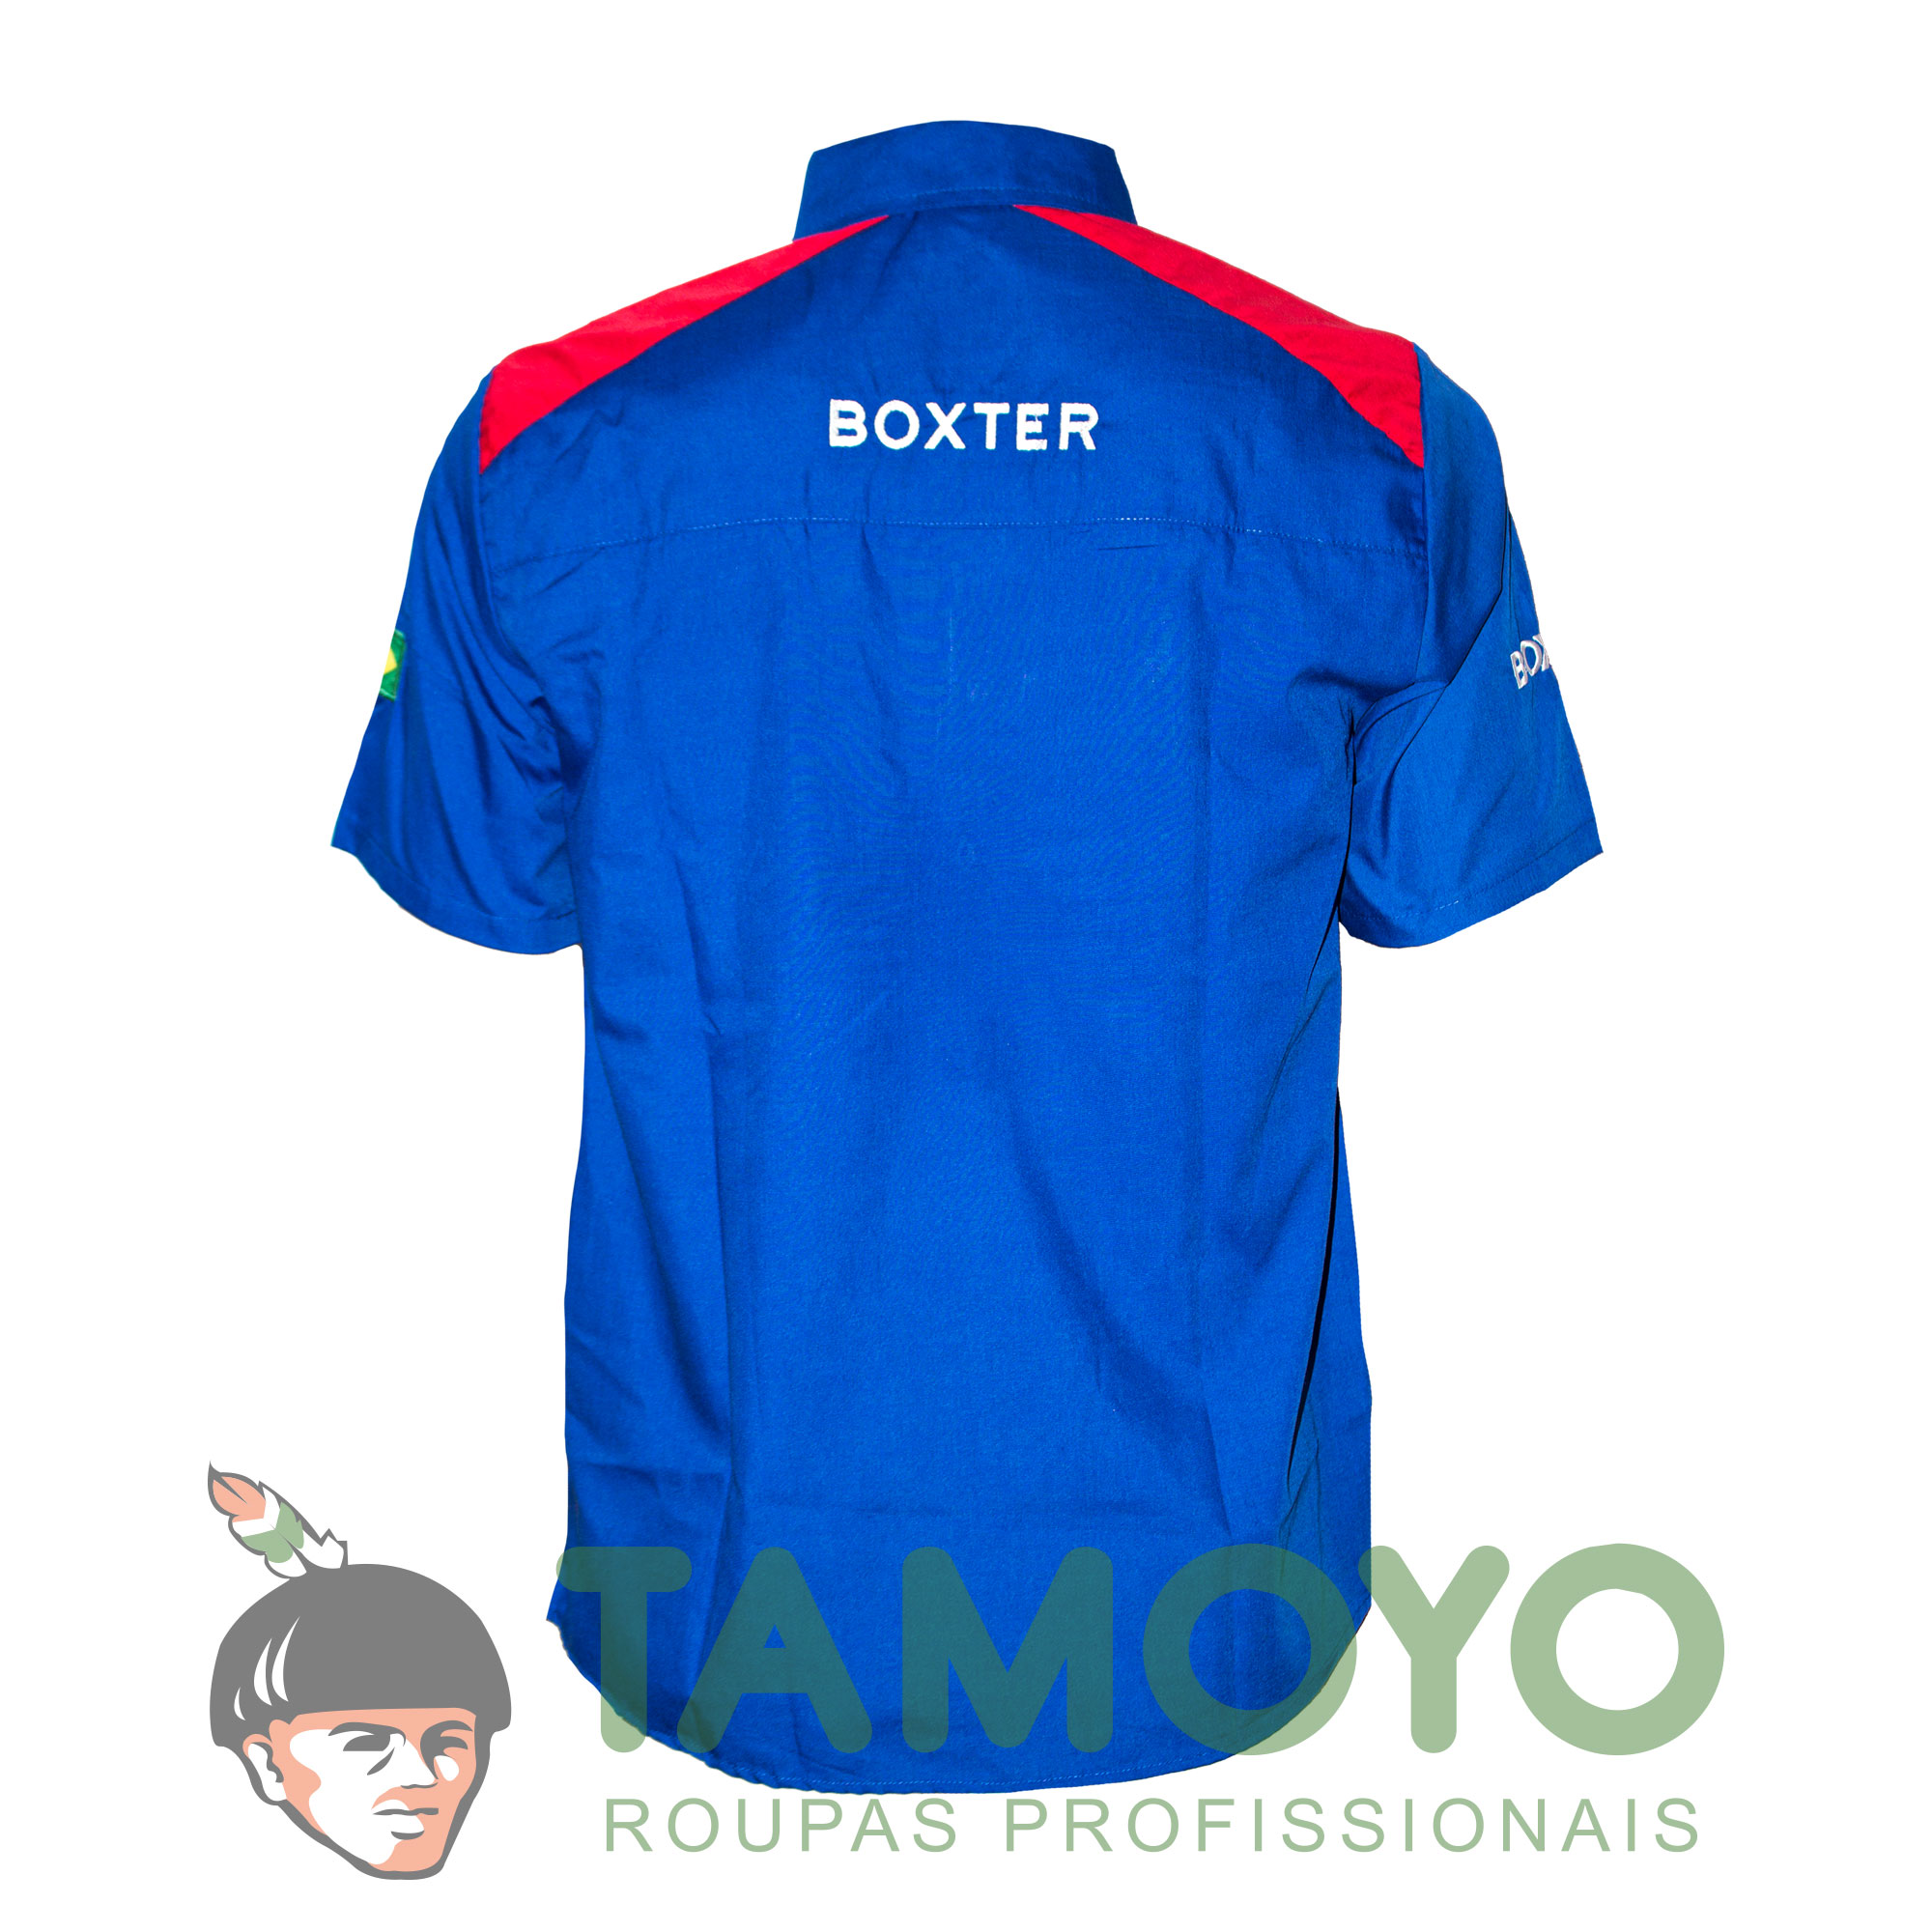 camisa-frentista-masculino-roupas-tamoyo-uniformes-profissionais-c